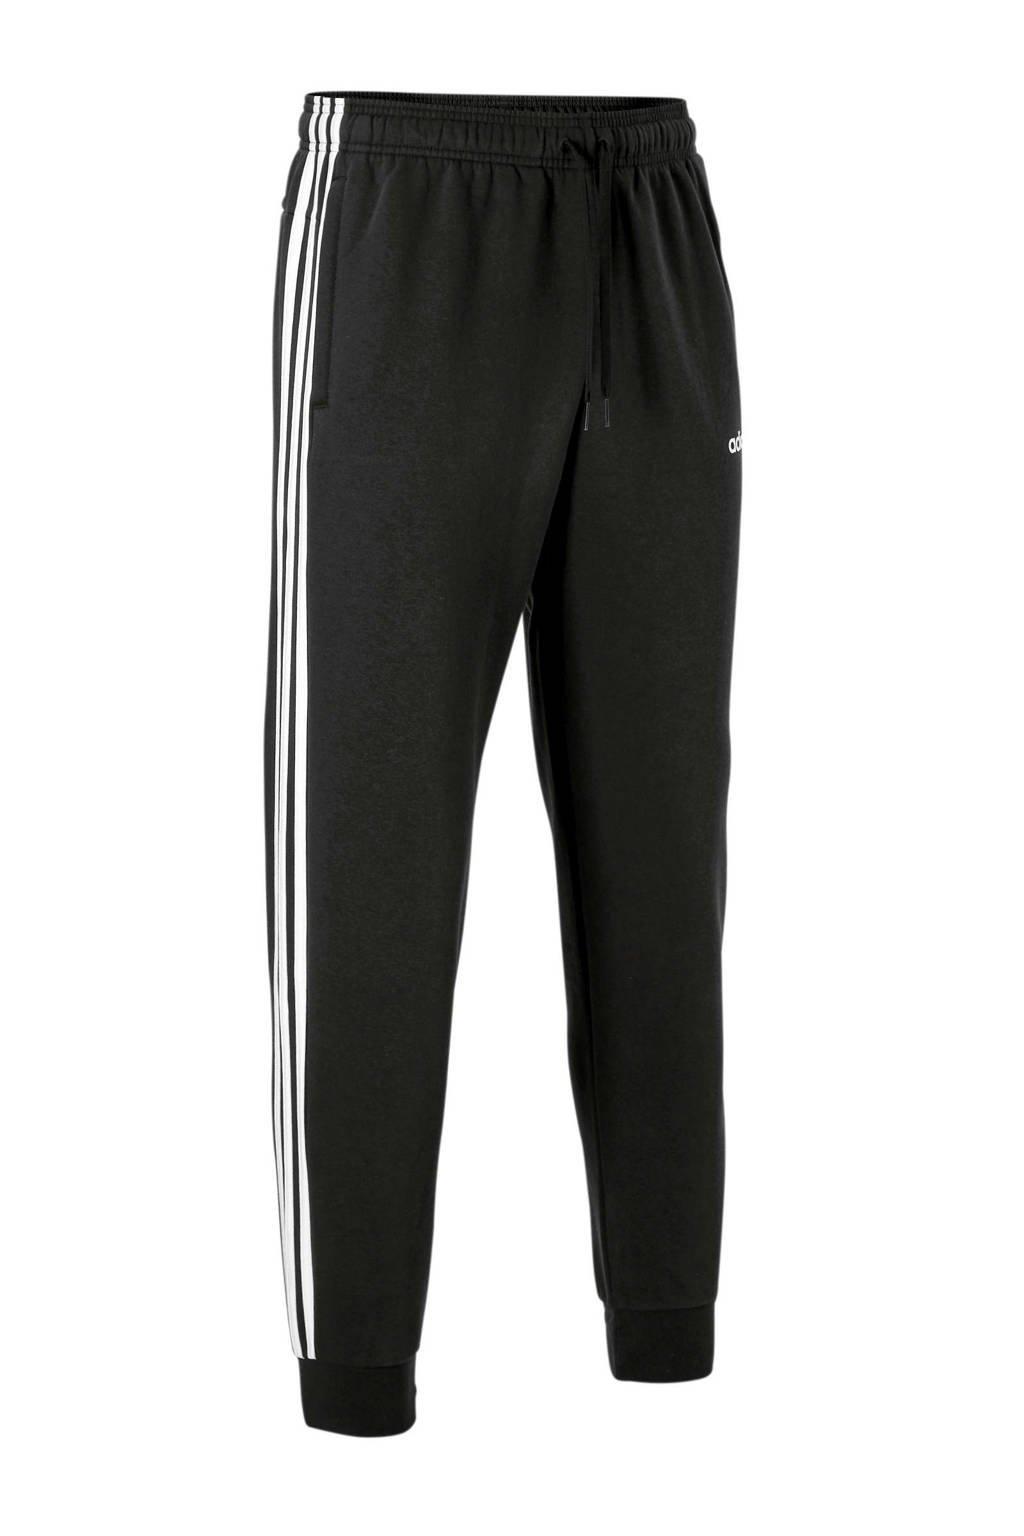 adidas   joggingbroek zwart, Zwart/wit